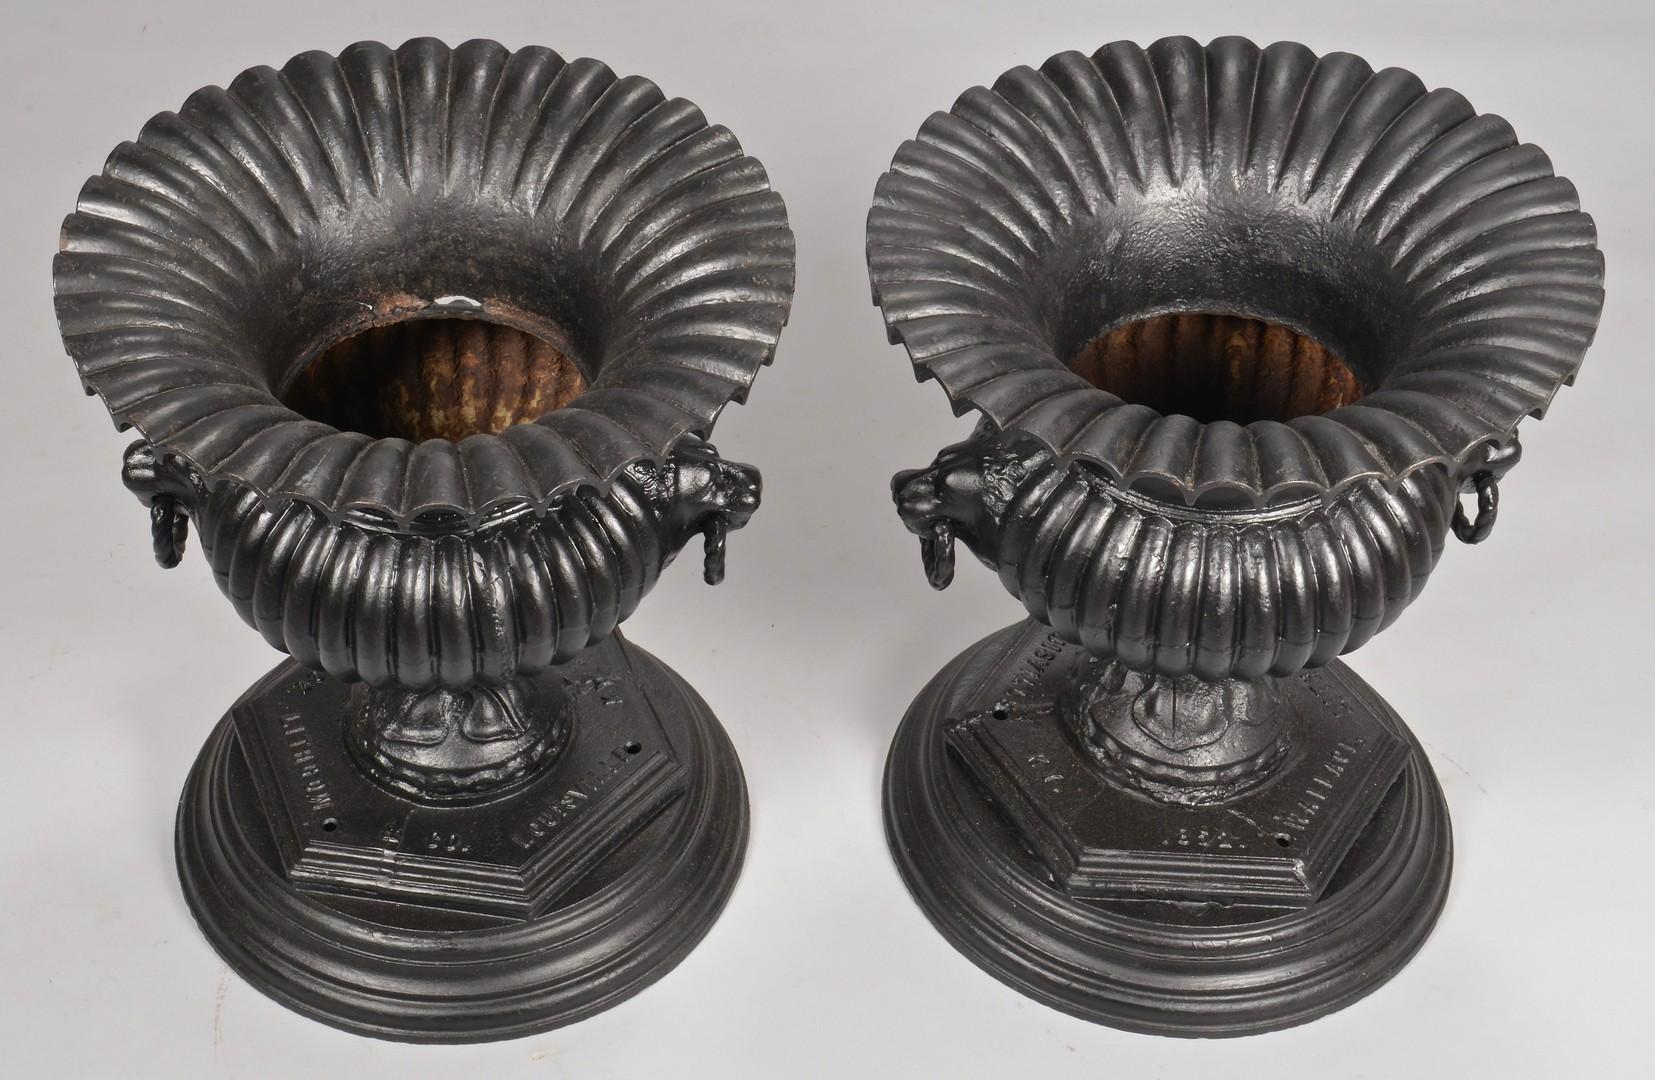 Lot 641: Pair Of Louisville, KY Marked Garden Urns